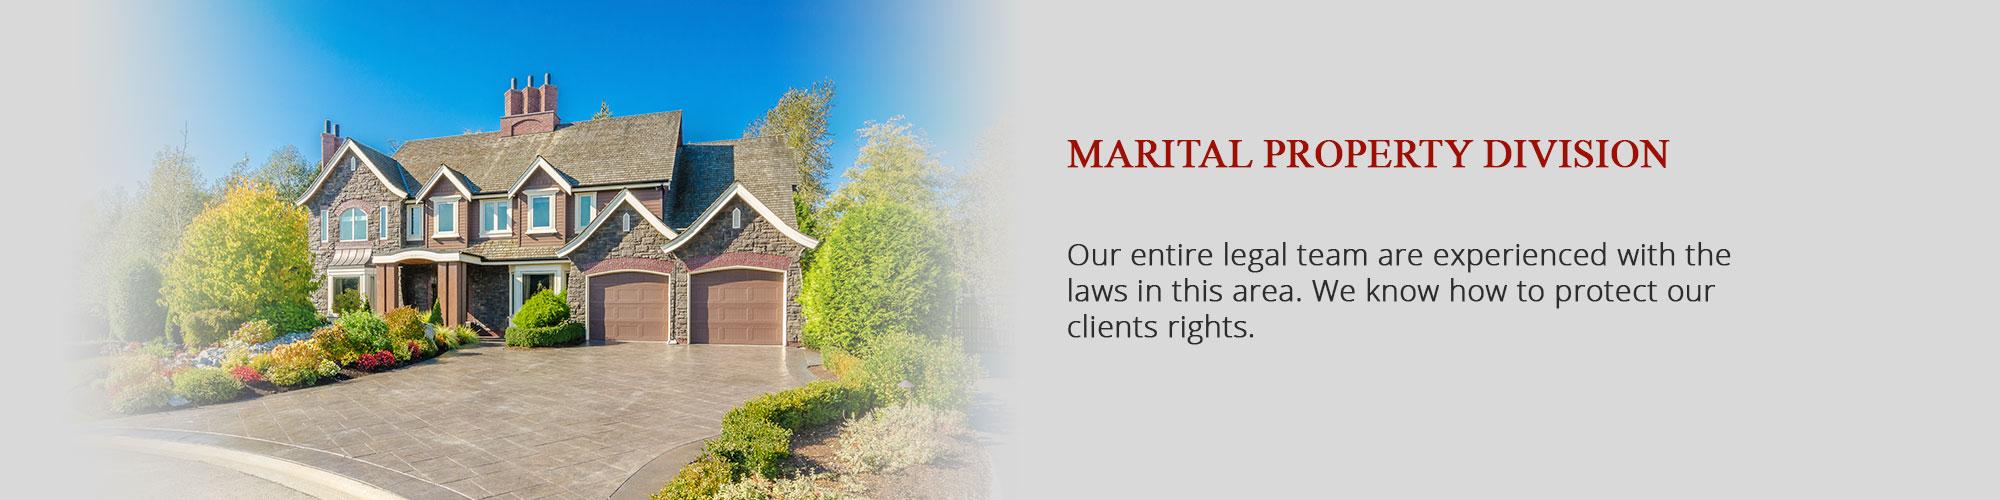 Marital Property Lawyers in Dallas